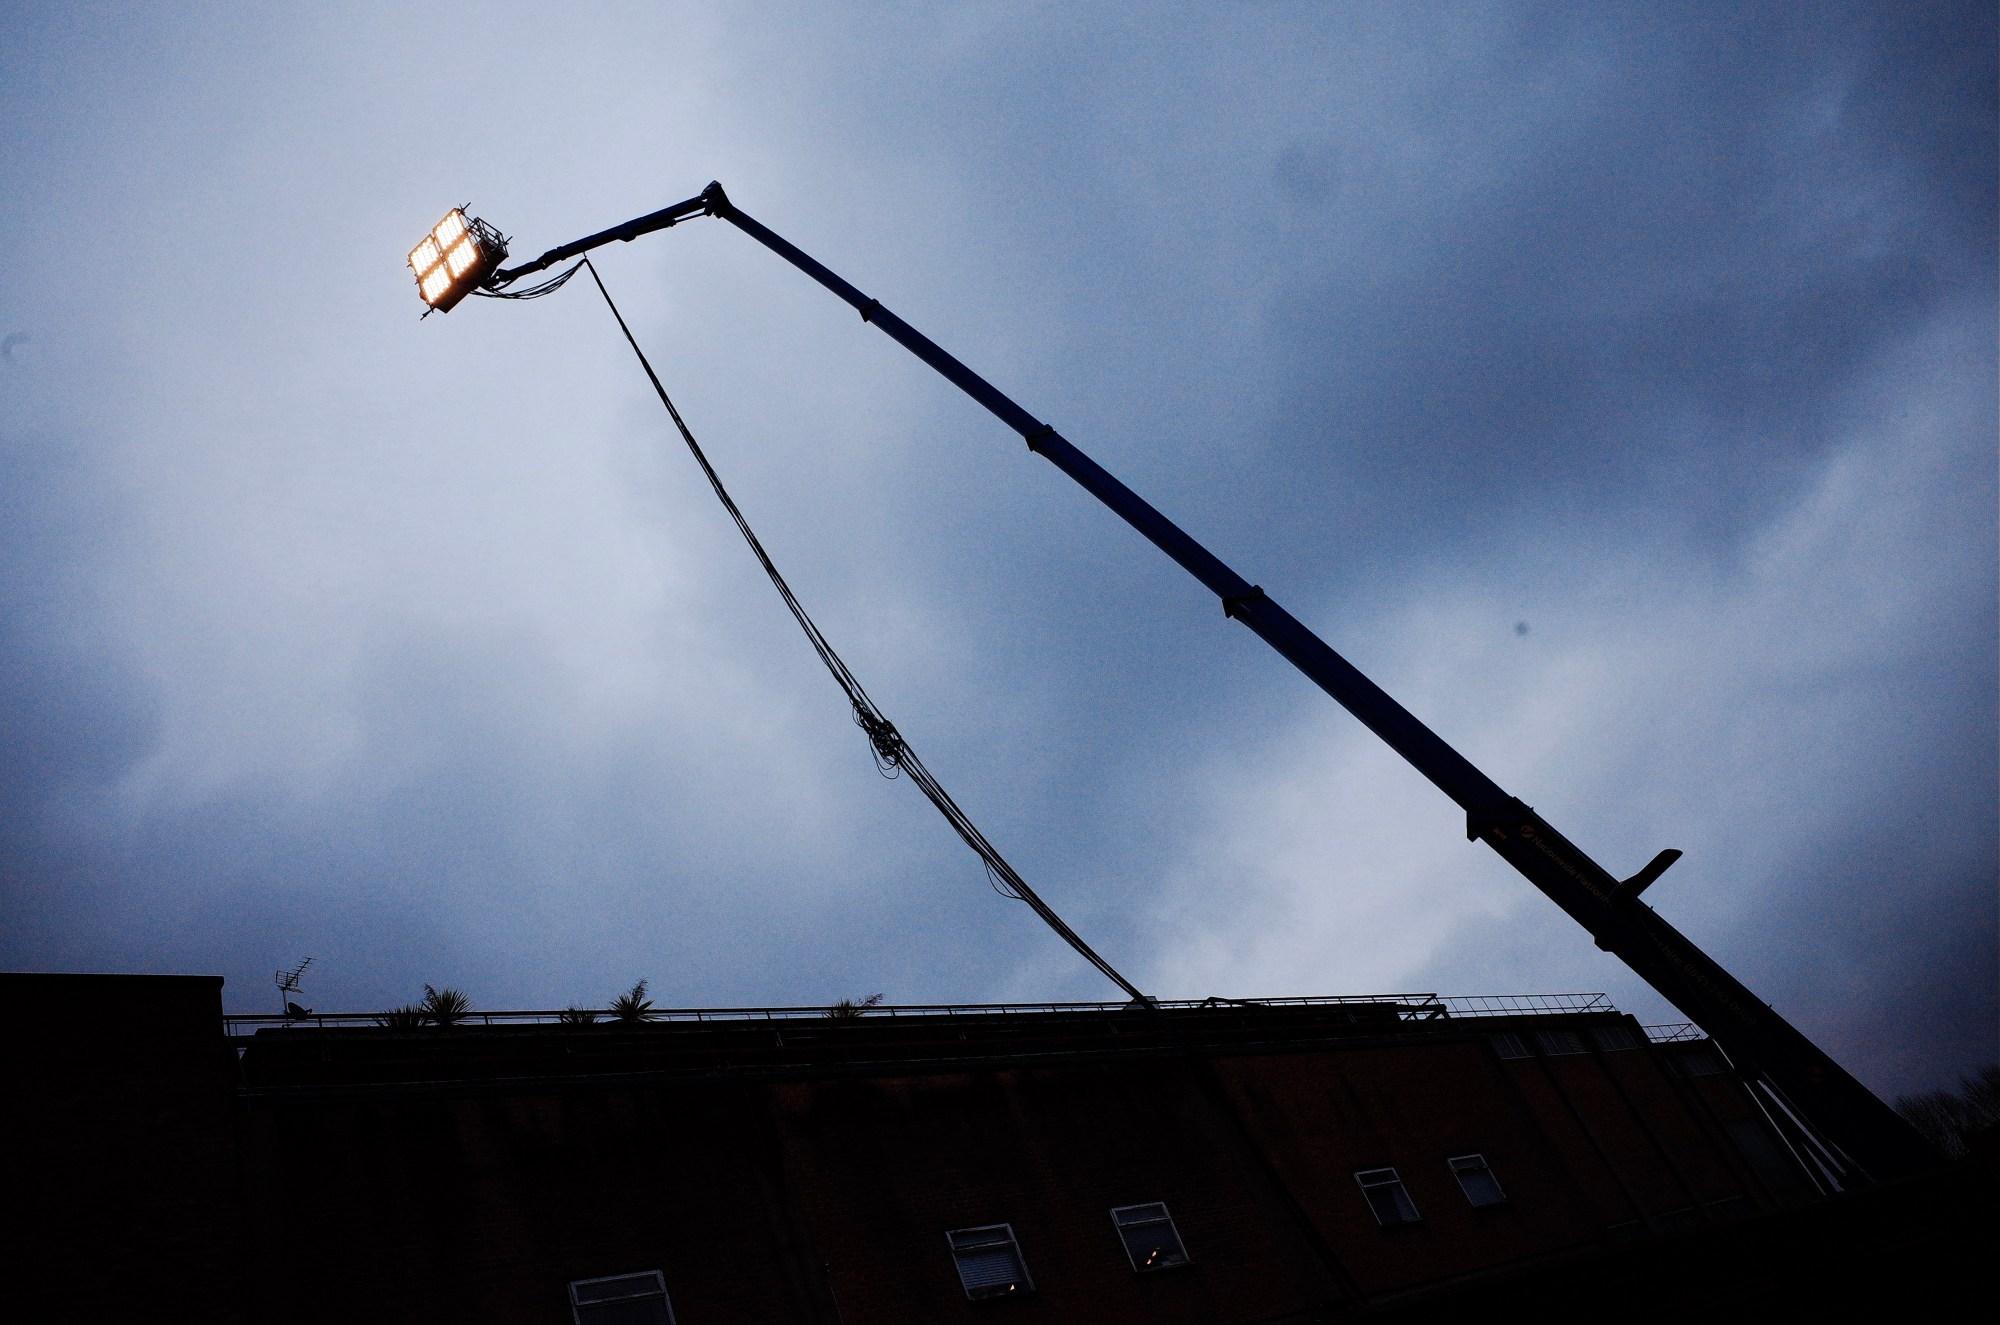 crane and lighting, london 2018